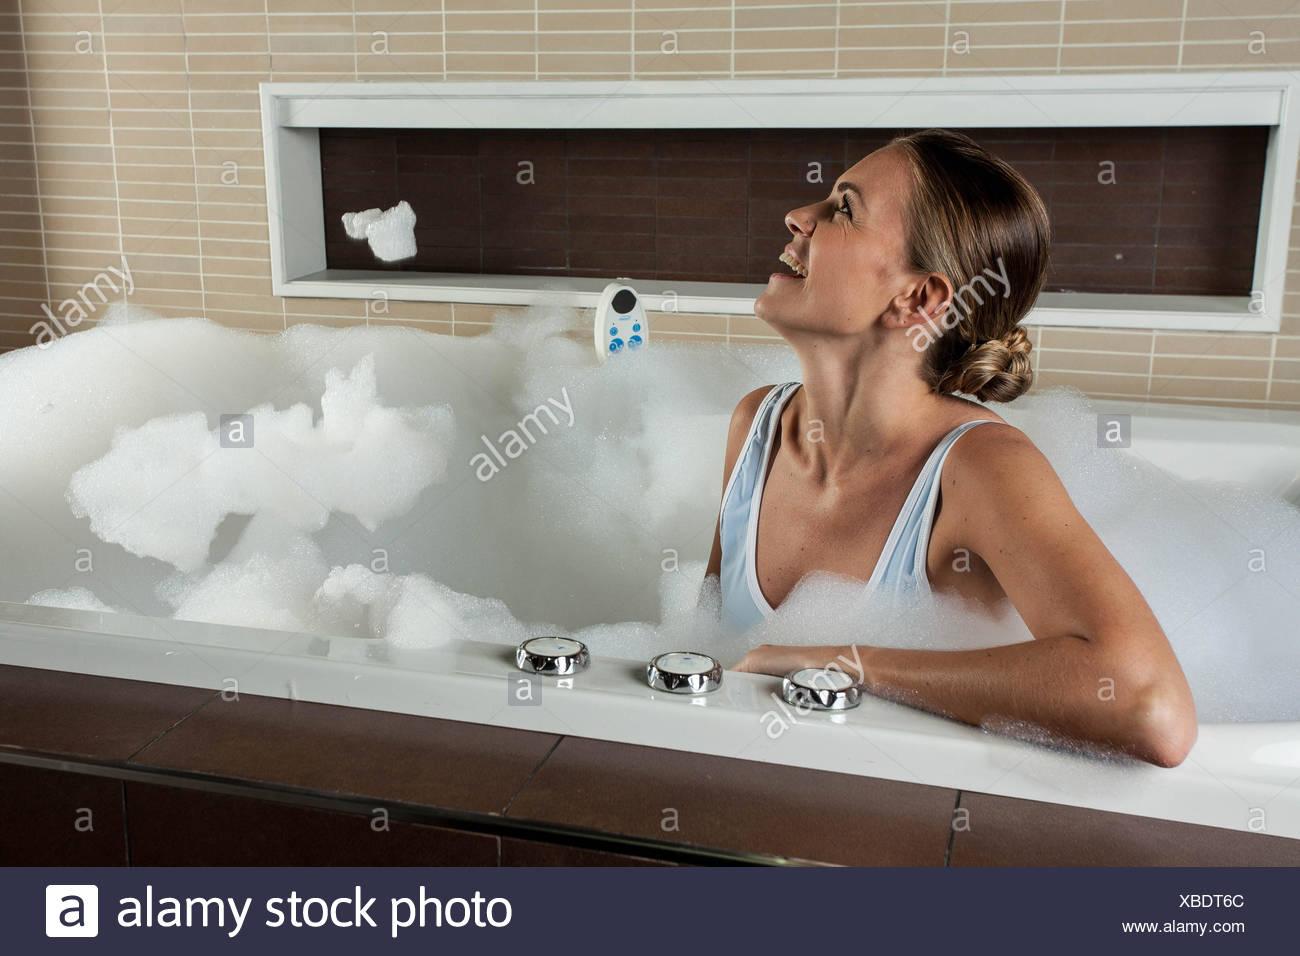 Donna Dentro La Vasca Da Bagno Foto Stock Alamy